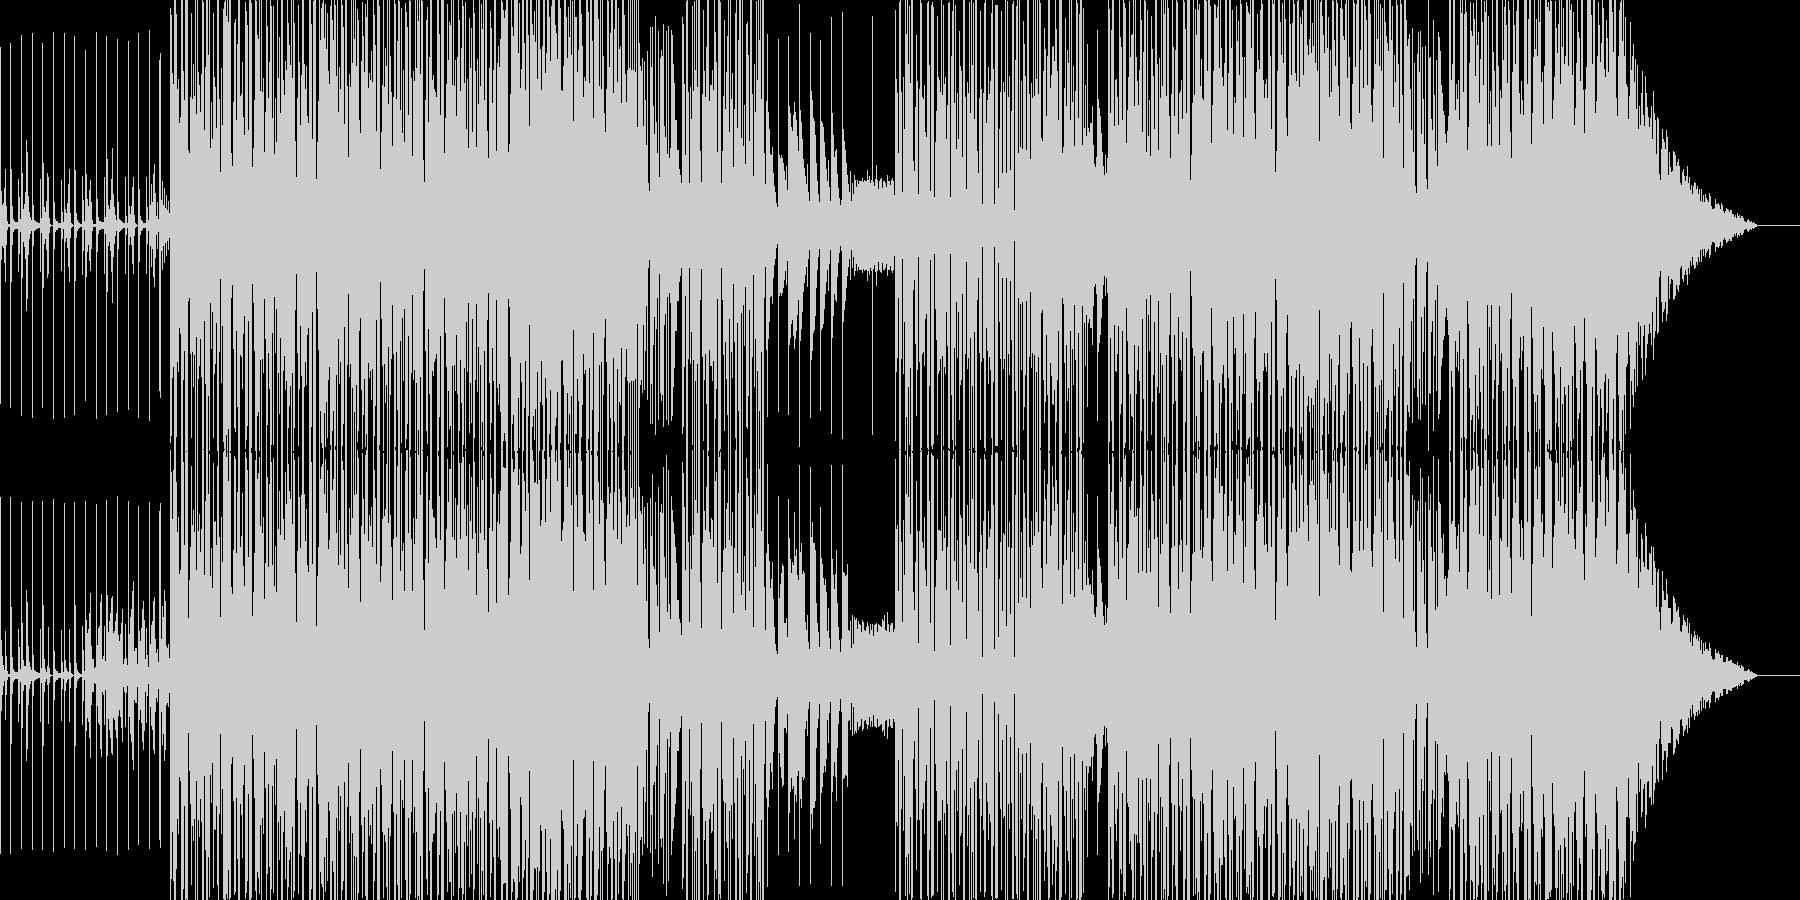 20121214(solitude)の未再生の波形